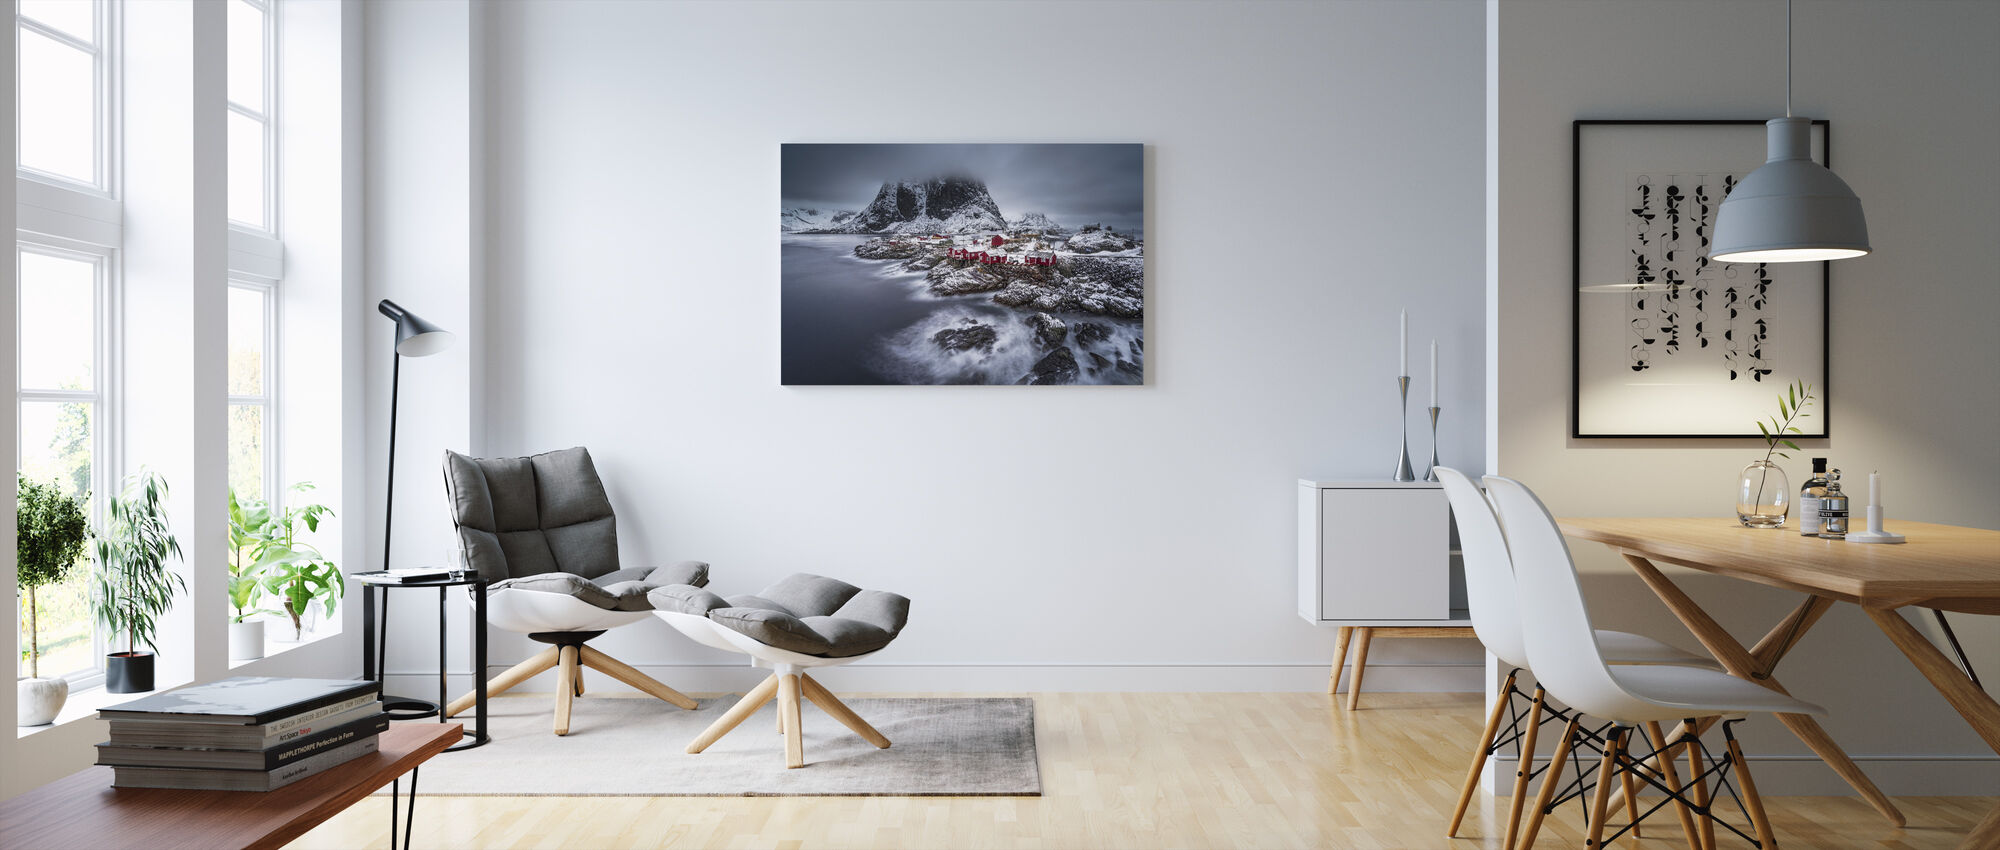 Winter Lofoten Islands - Canvastavla - Vardagsrum